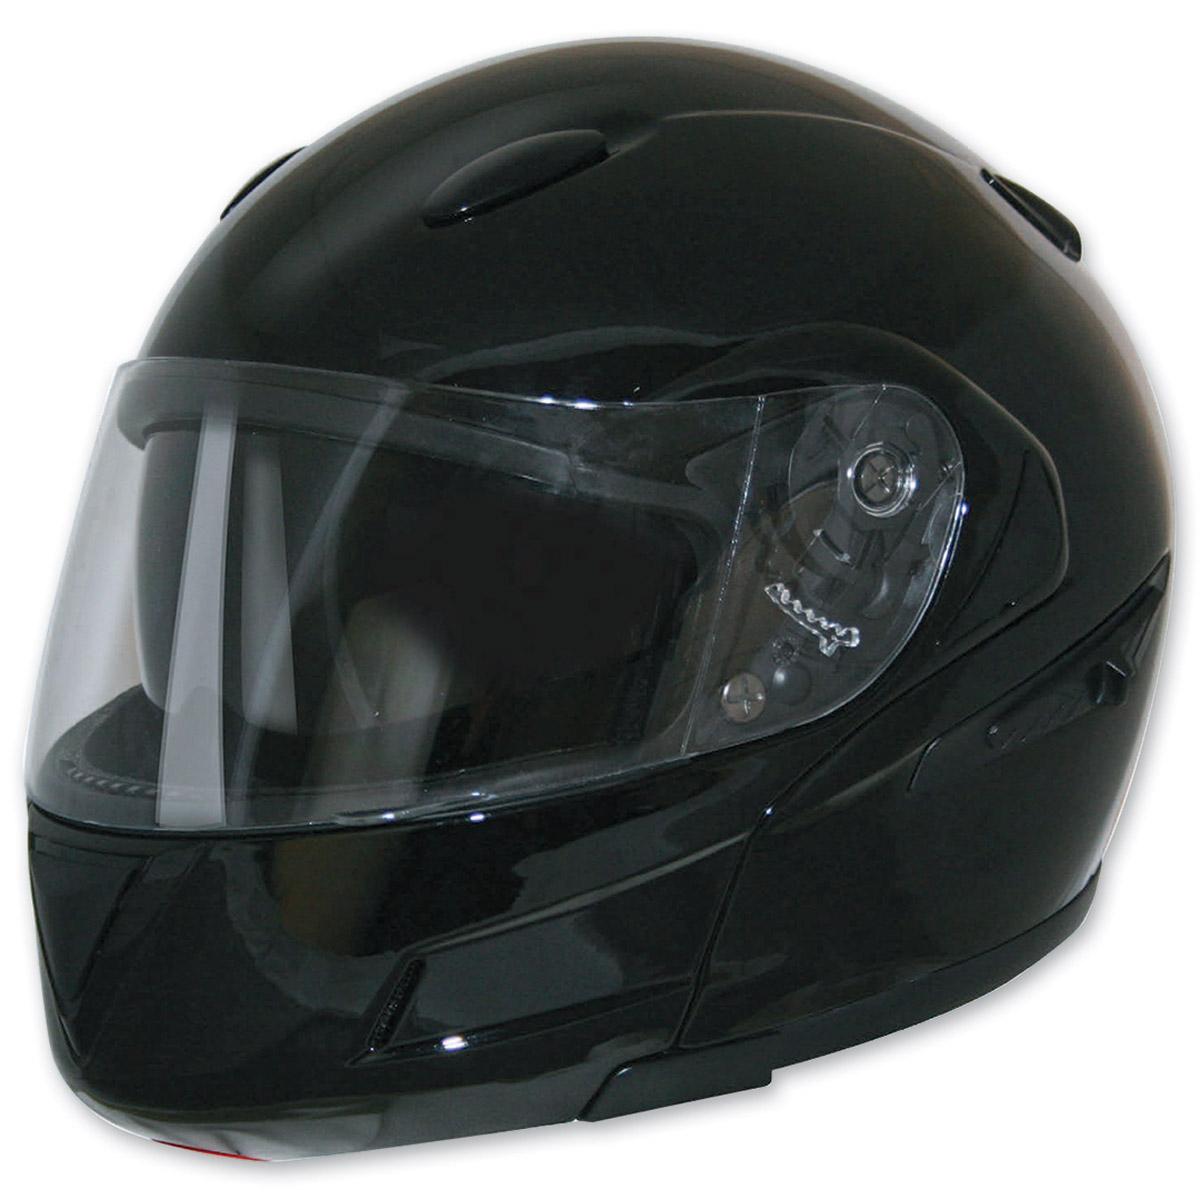 8cfe8f17 HCI-89 Black Modular Helmet - 89-810-06 | JPCycles.com